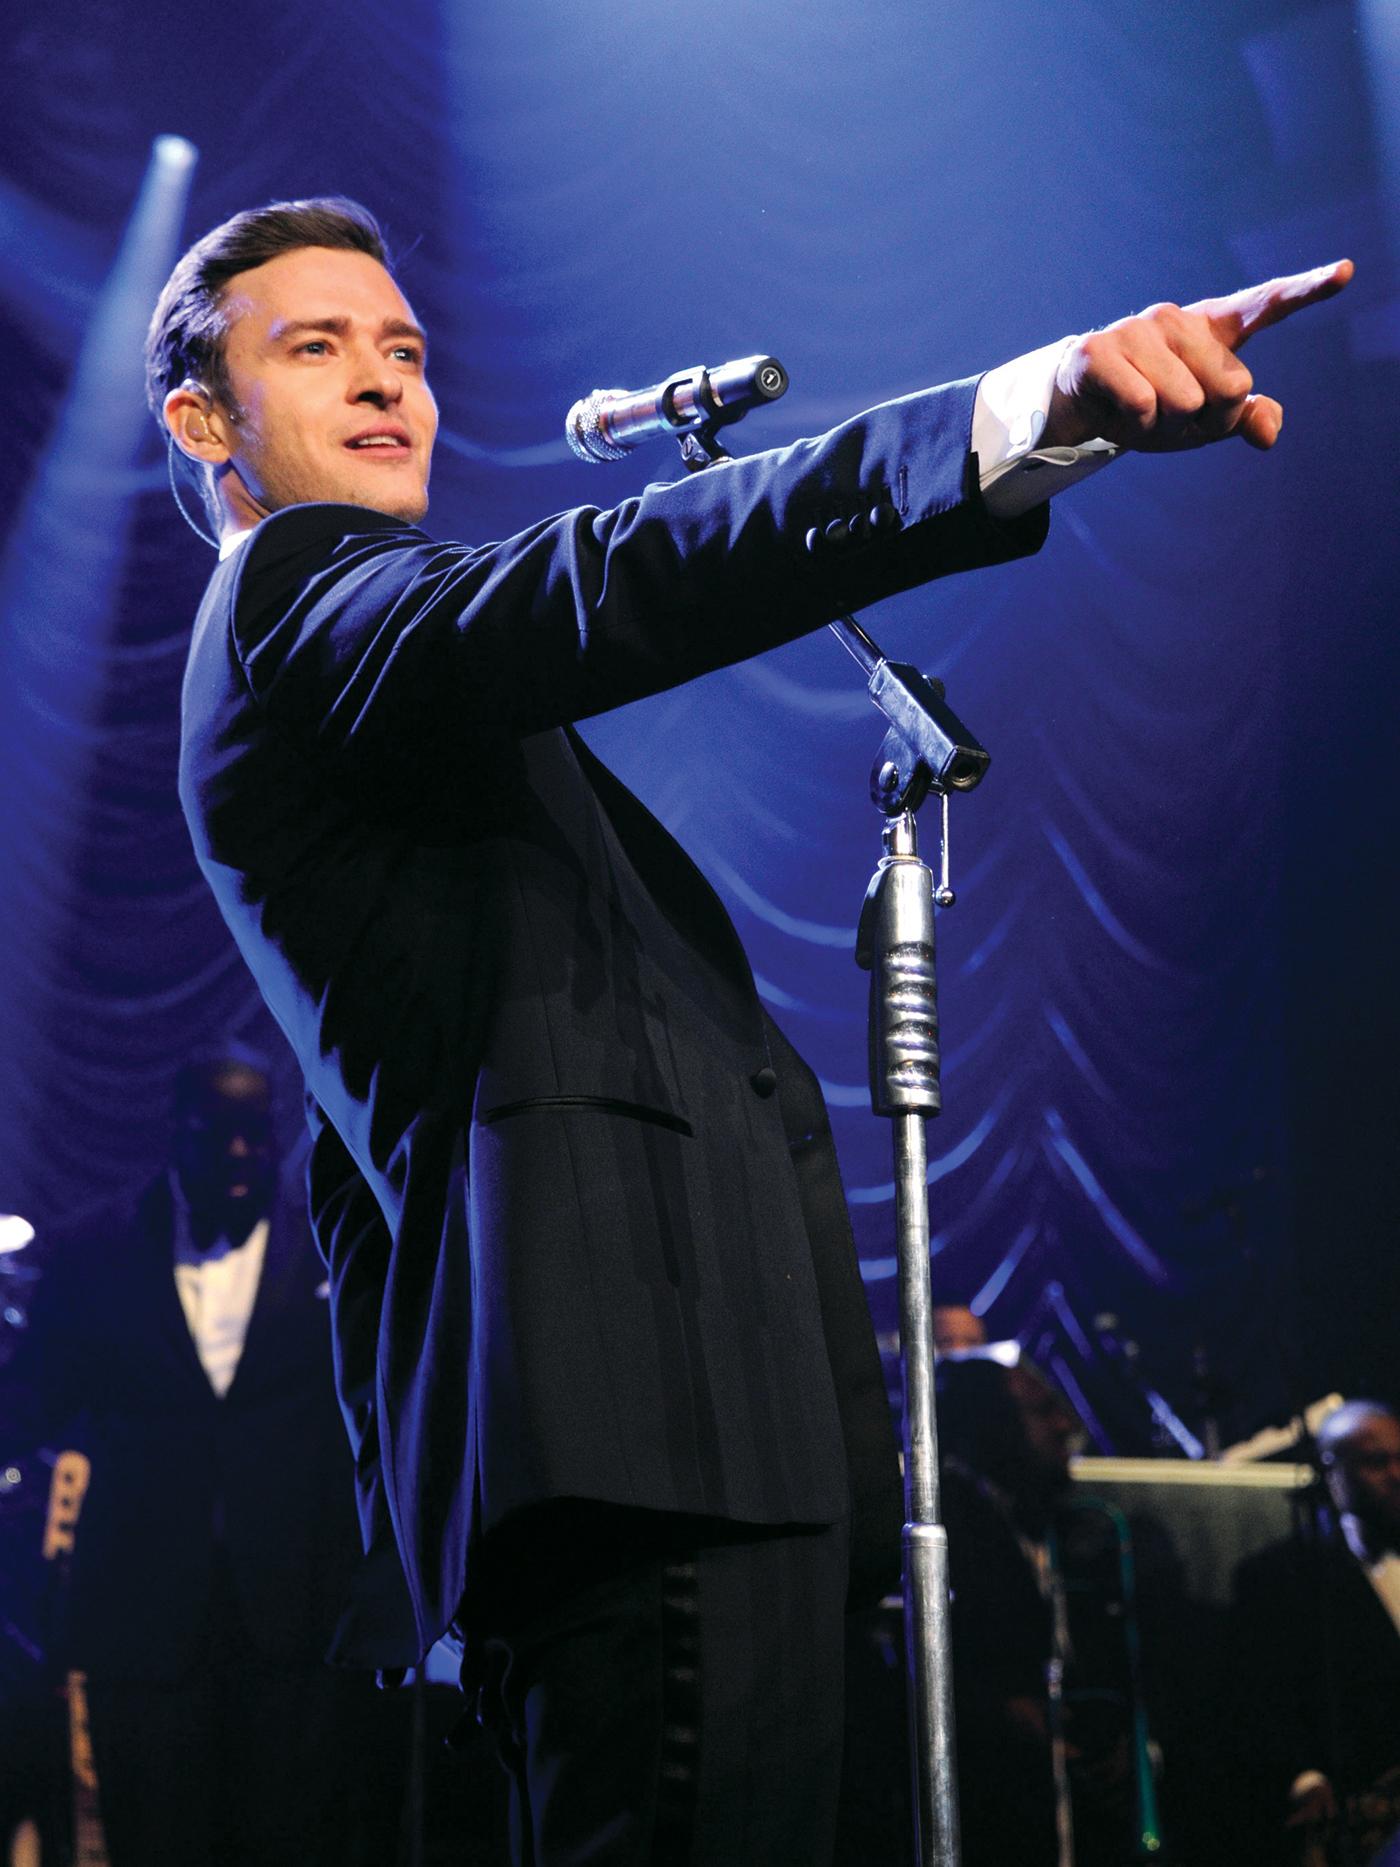 http://clynemedia.com/audiotechnica/Timberlake/Timberlake.jpg